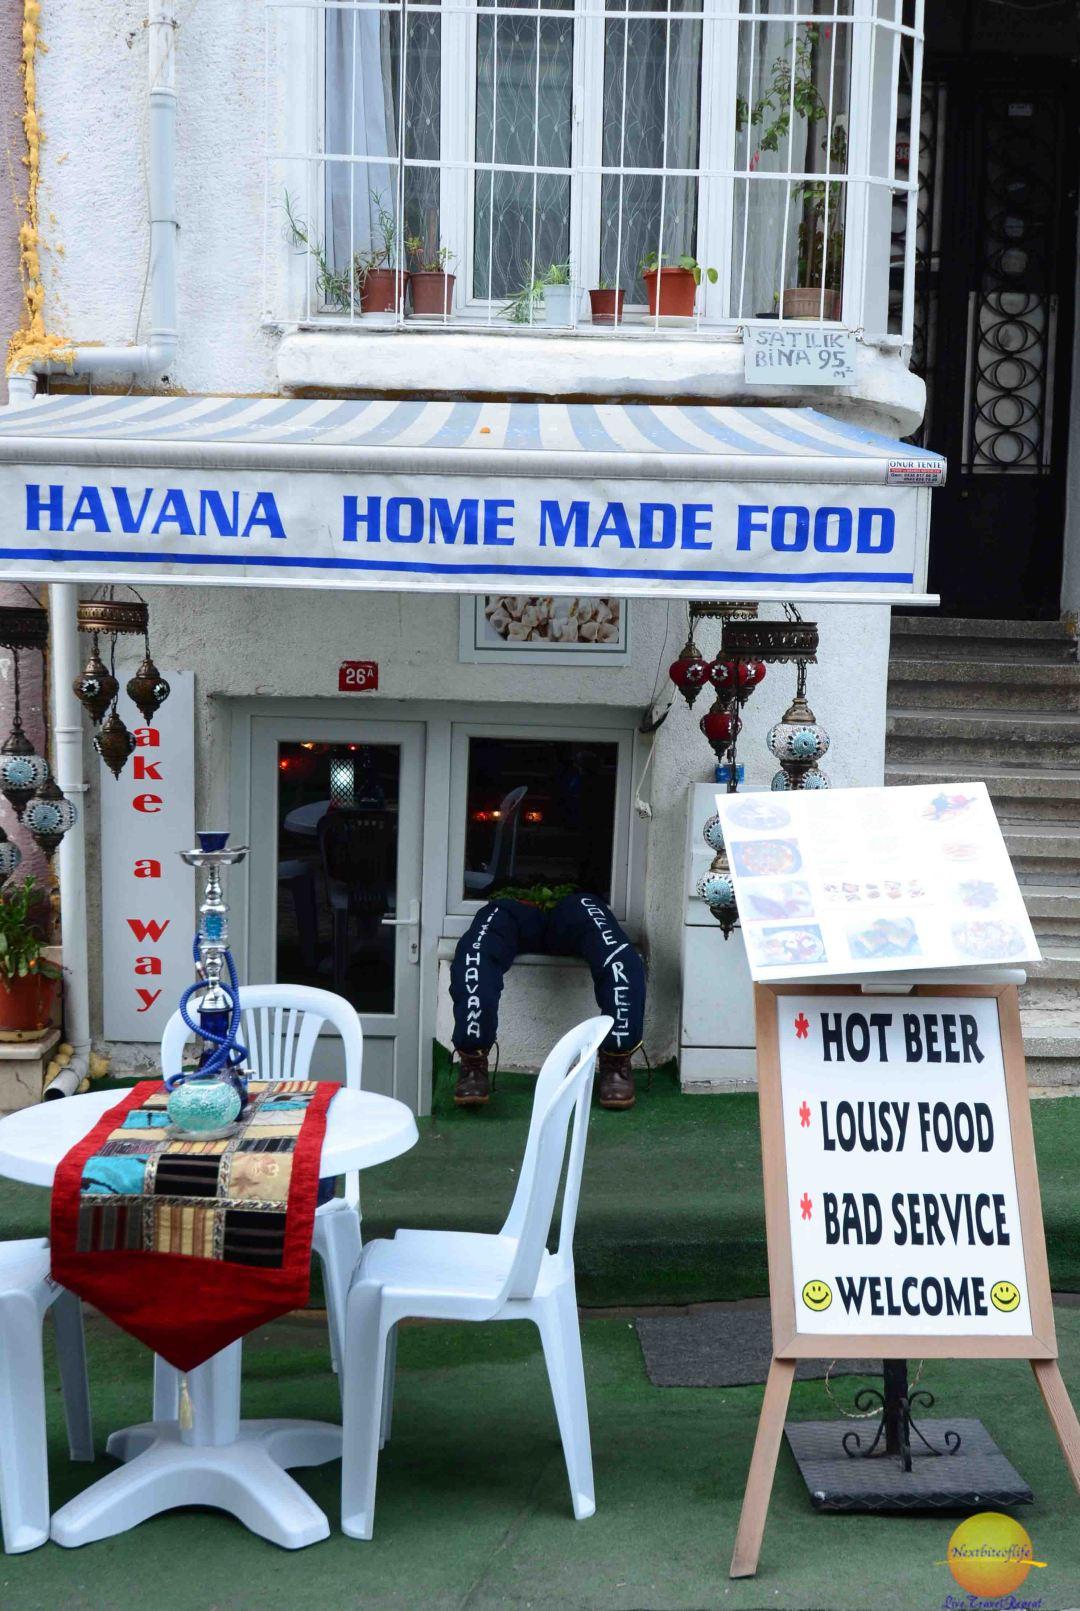 havana home made food stand istanbul